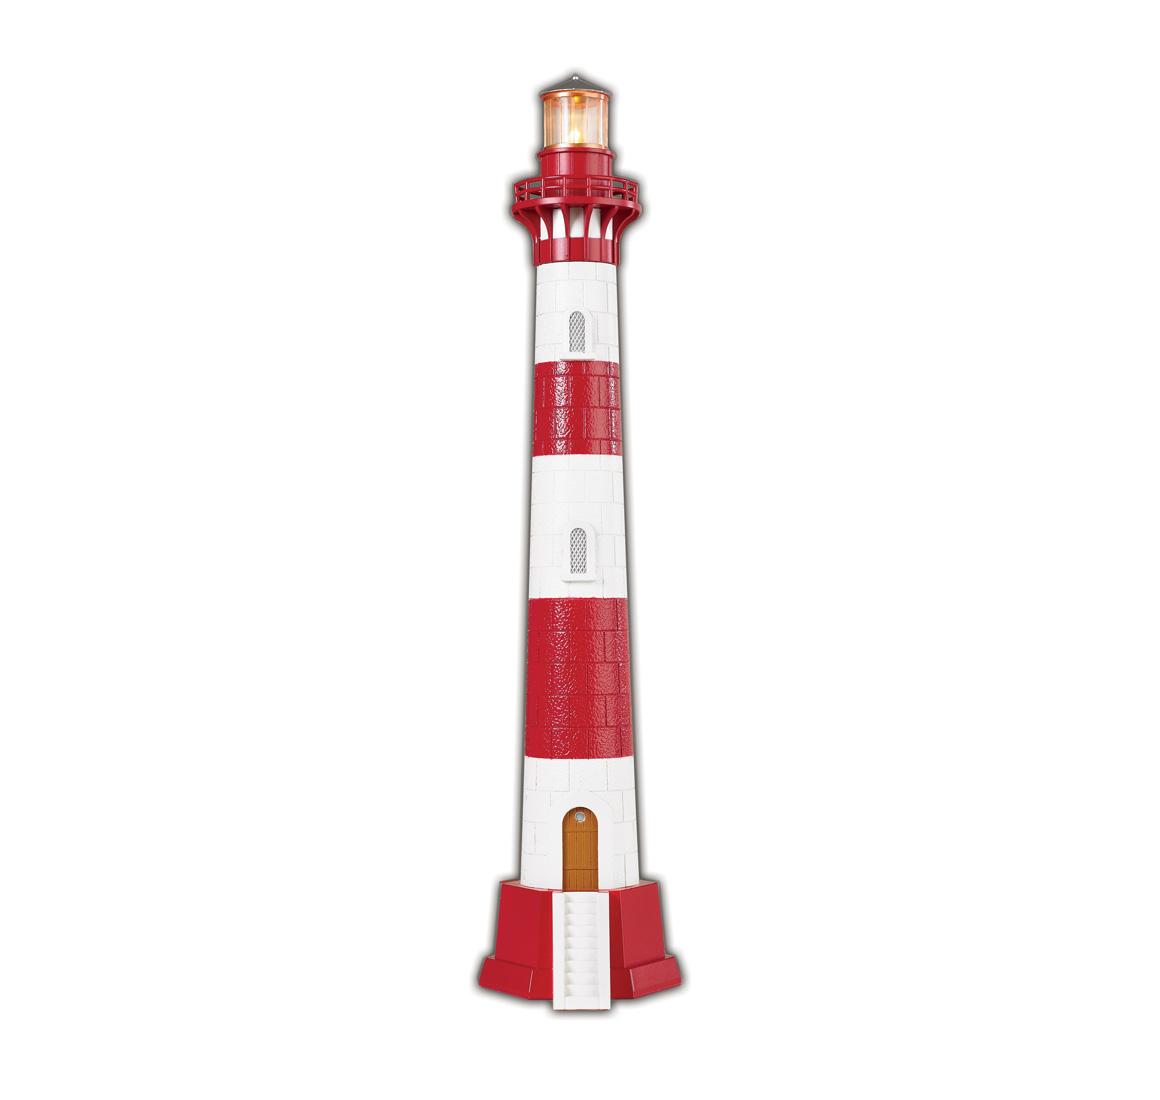 bachmann_thomas_friends_lighthouse_blinking_led